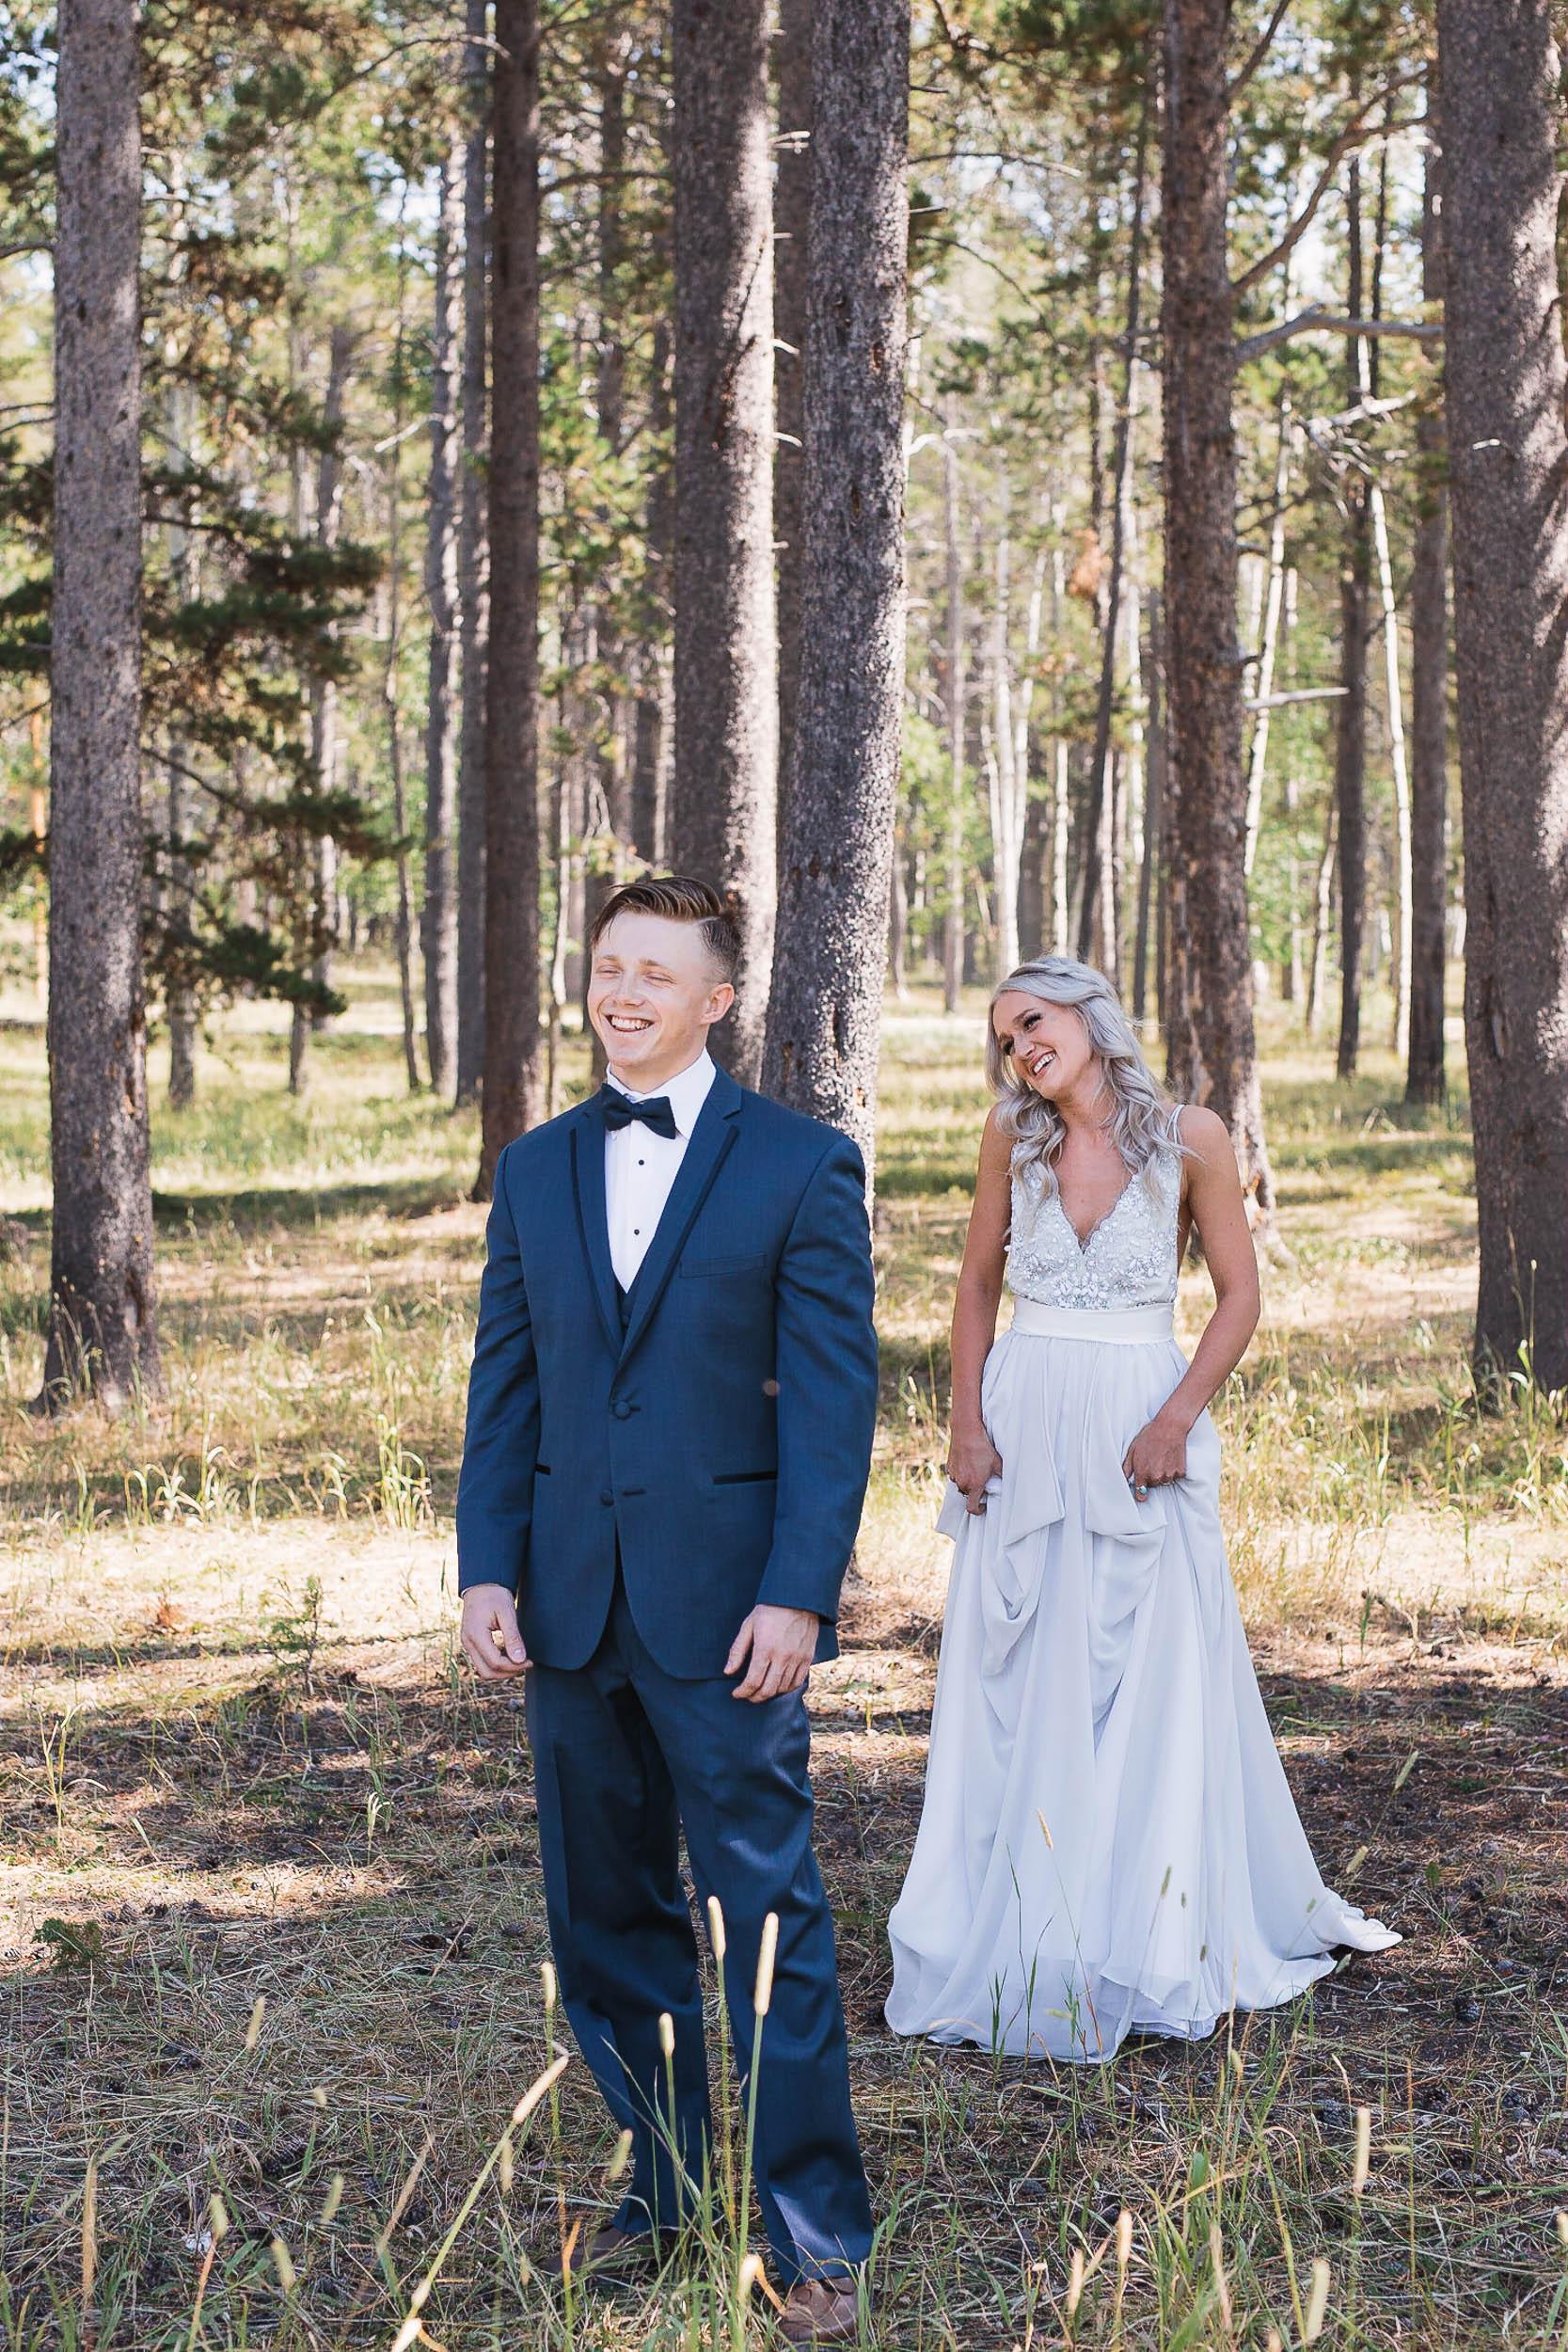 KyleLovesTori-Casper-Wyoming-Wedding-21.jpg